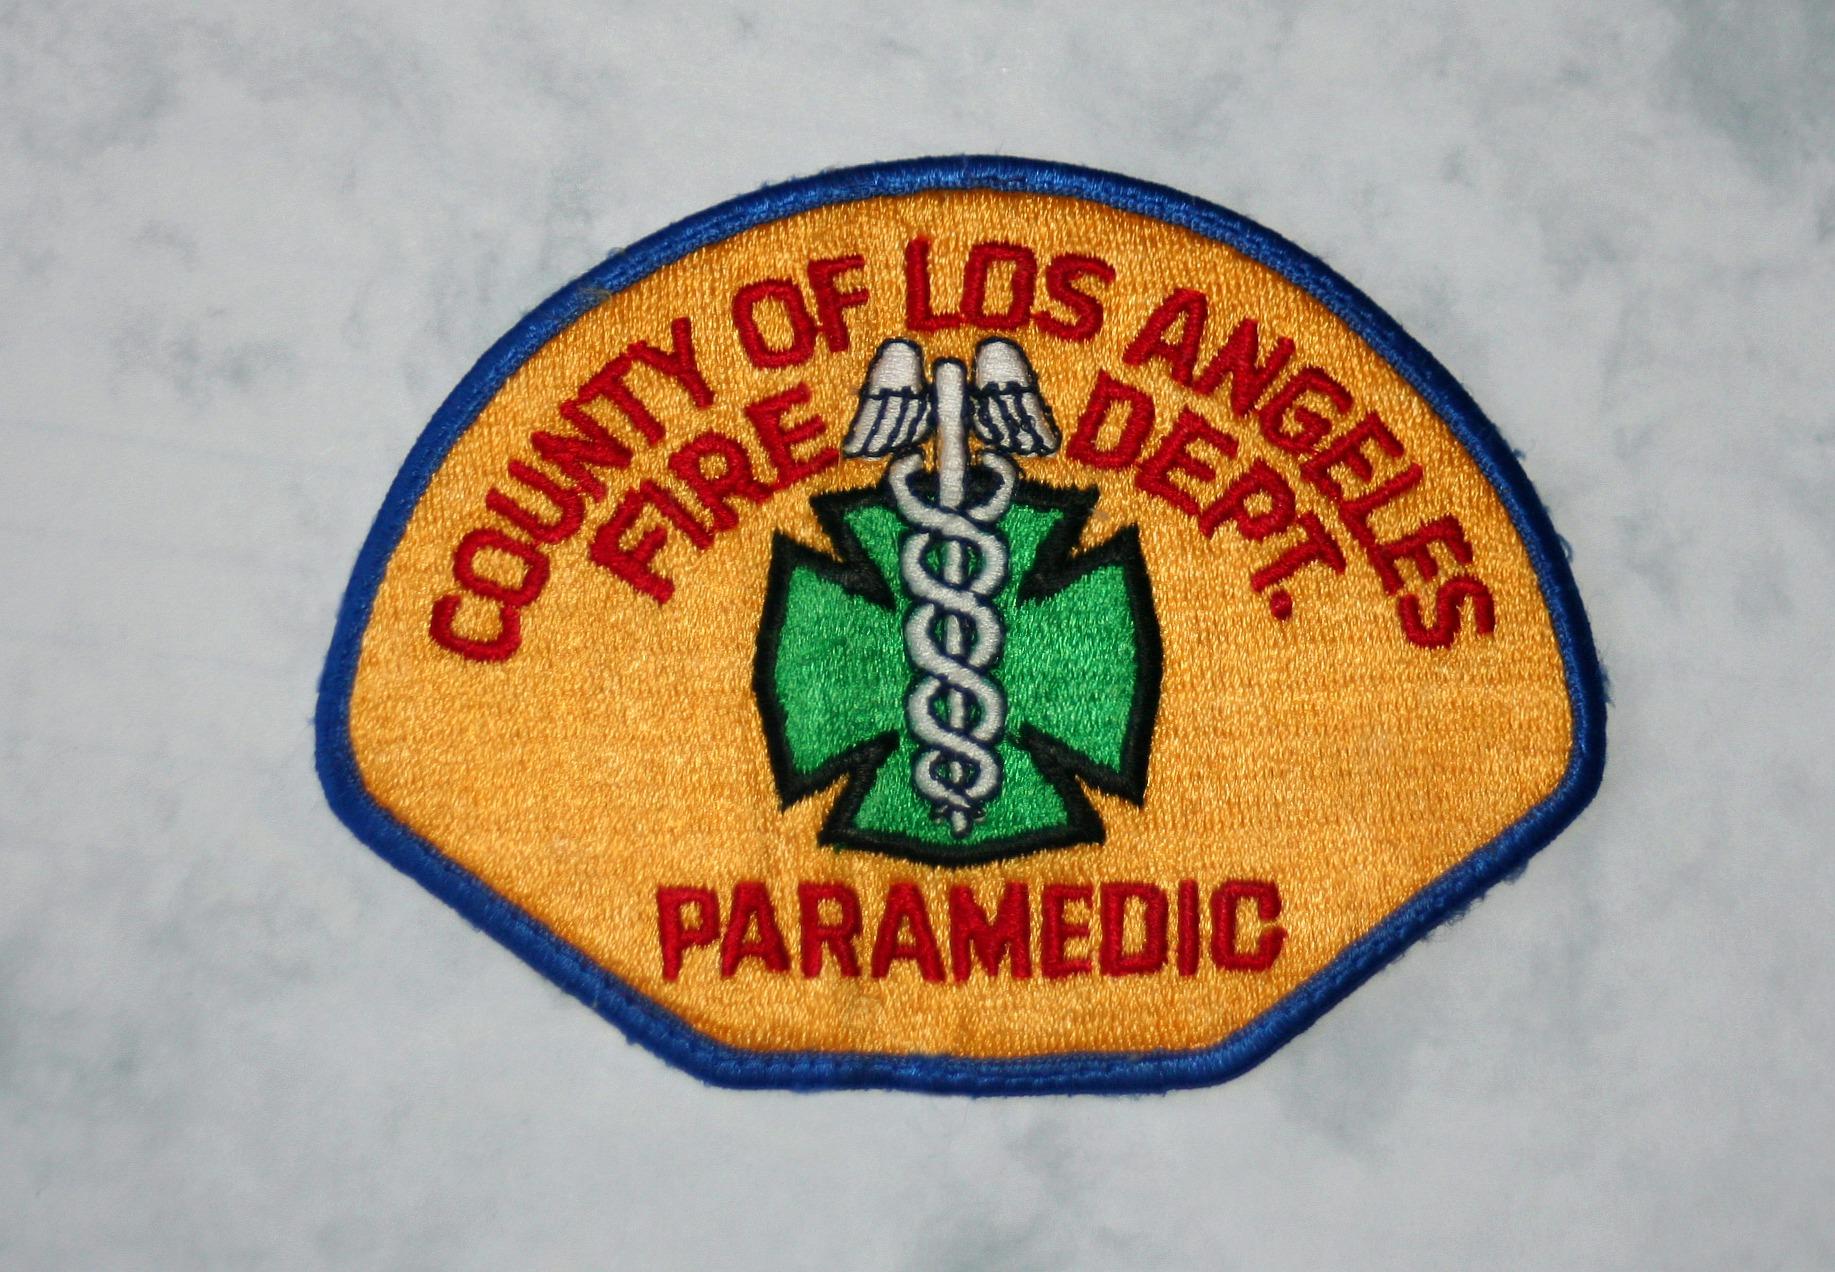 Los Angeles Fire Dept Paramedic